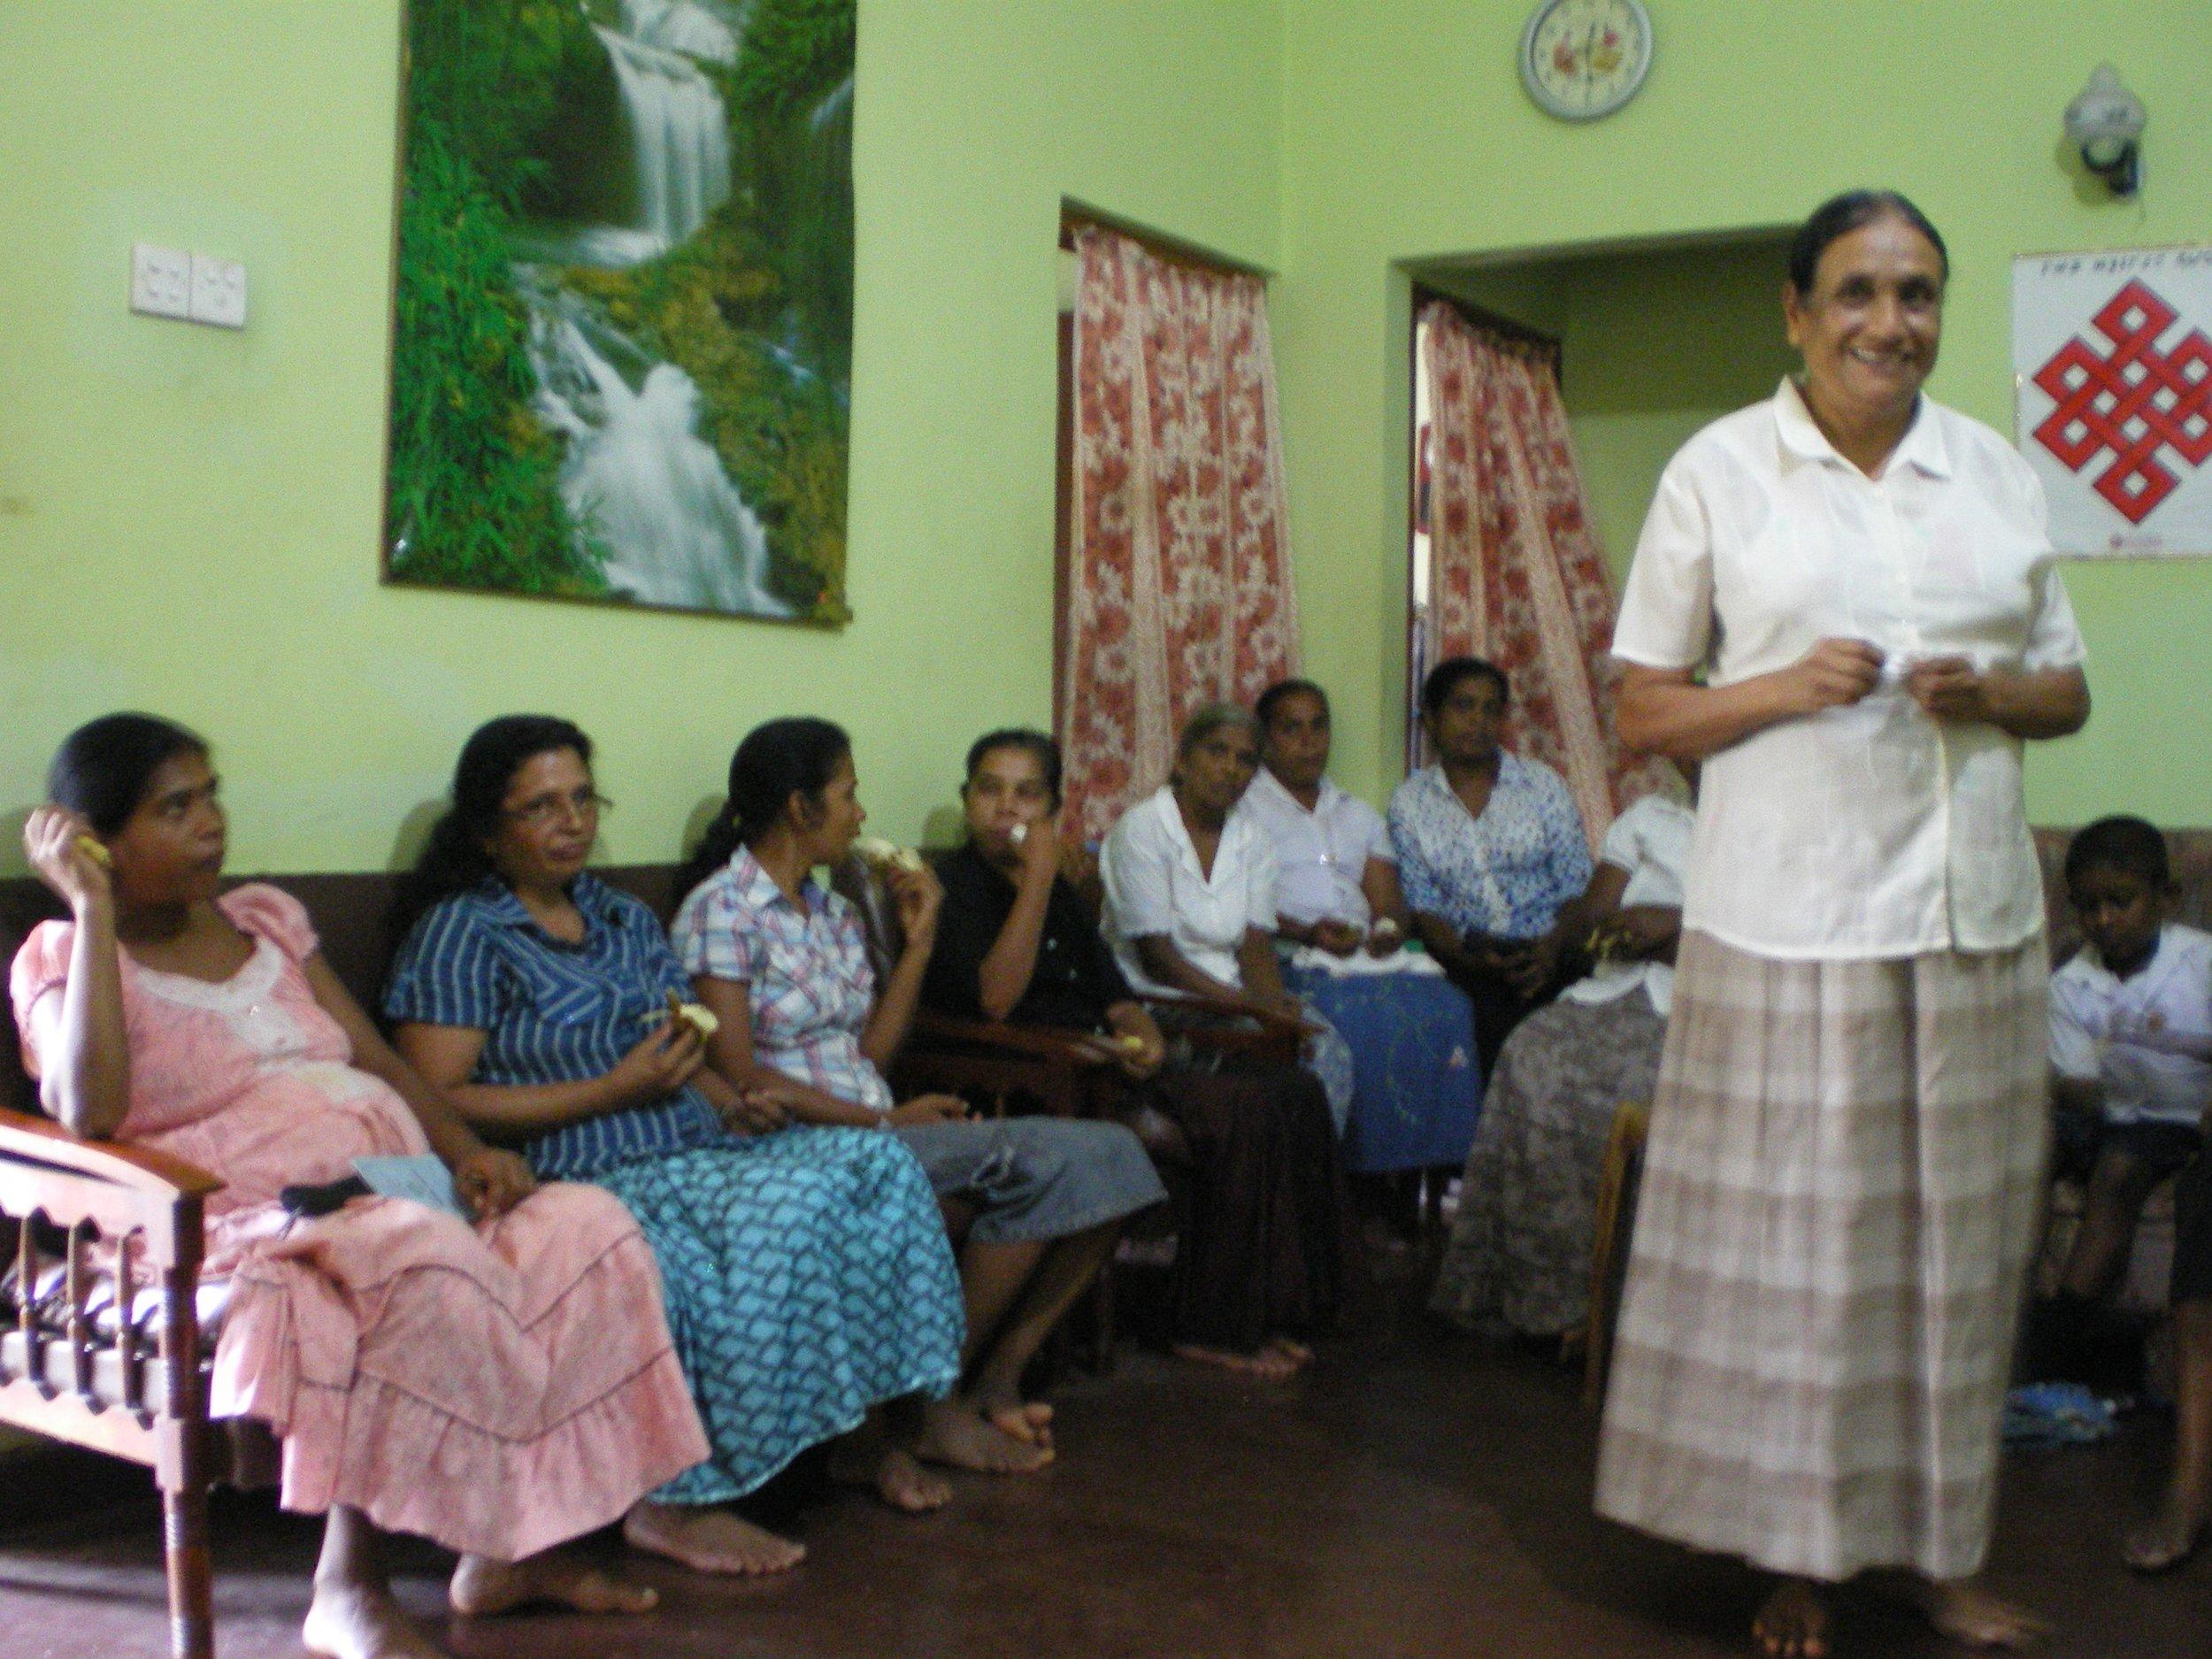 Women gathered for their self-help group meeting in Parakatawella, Sri Lanka.